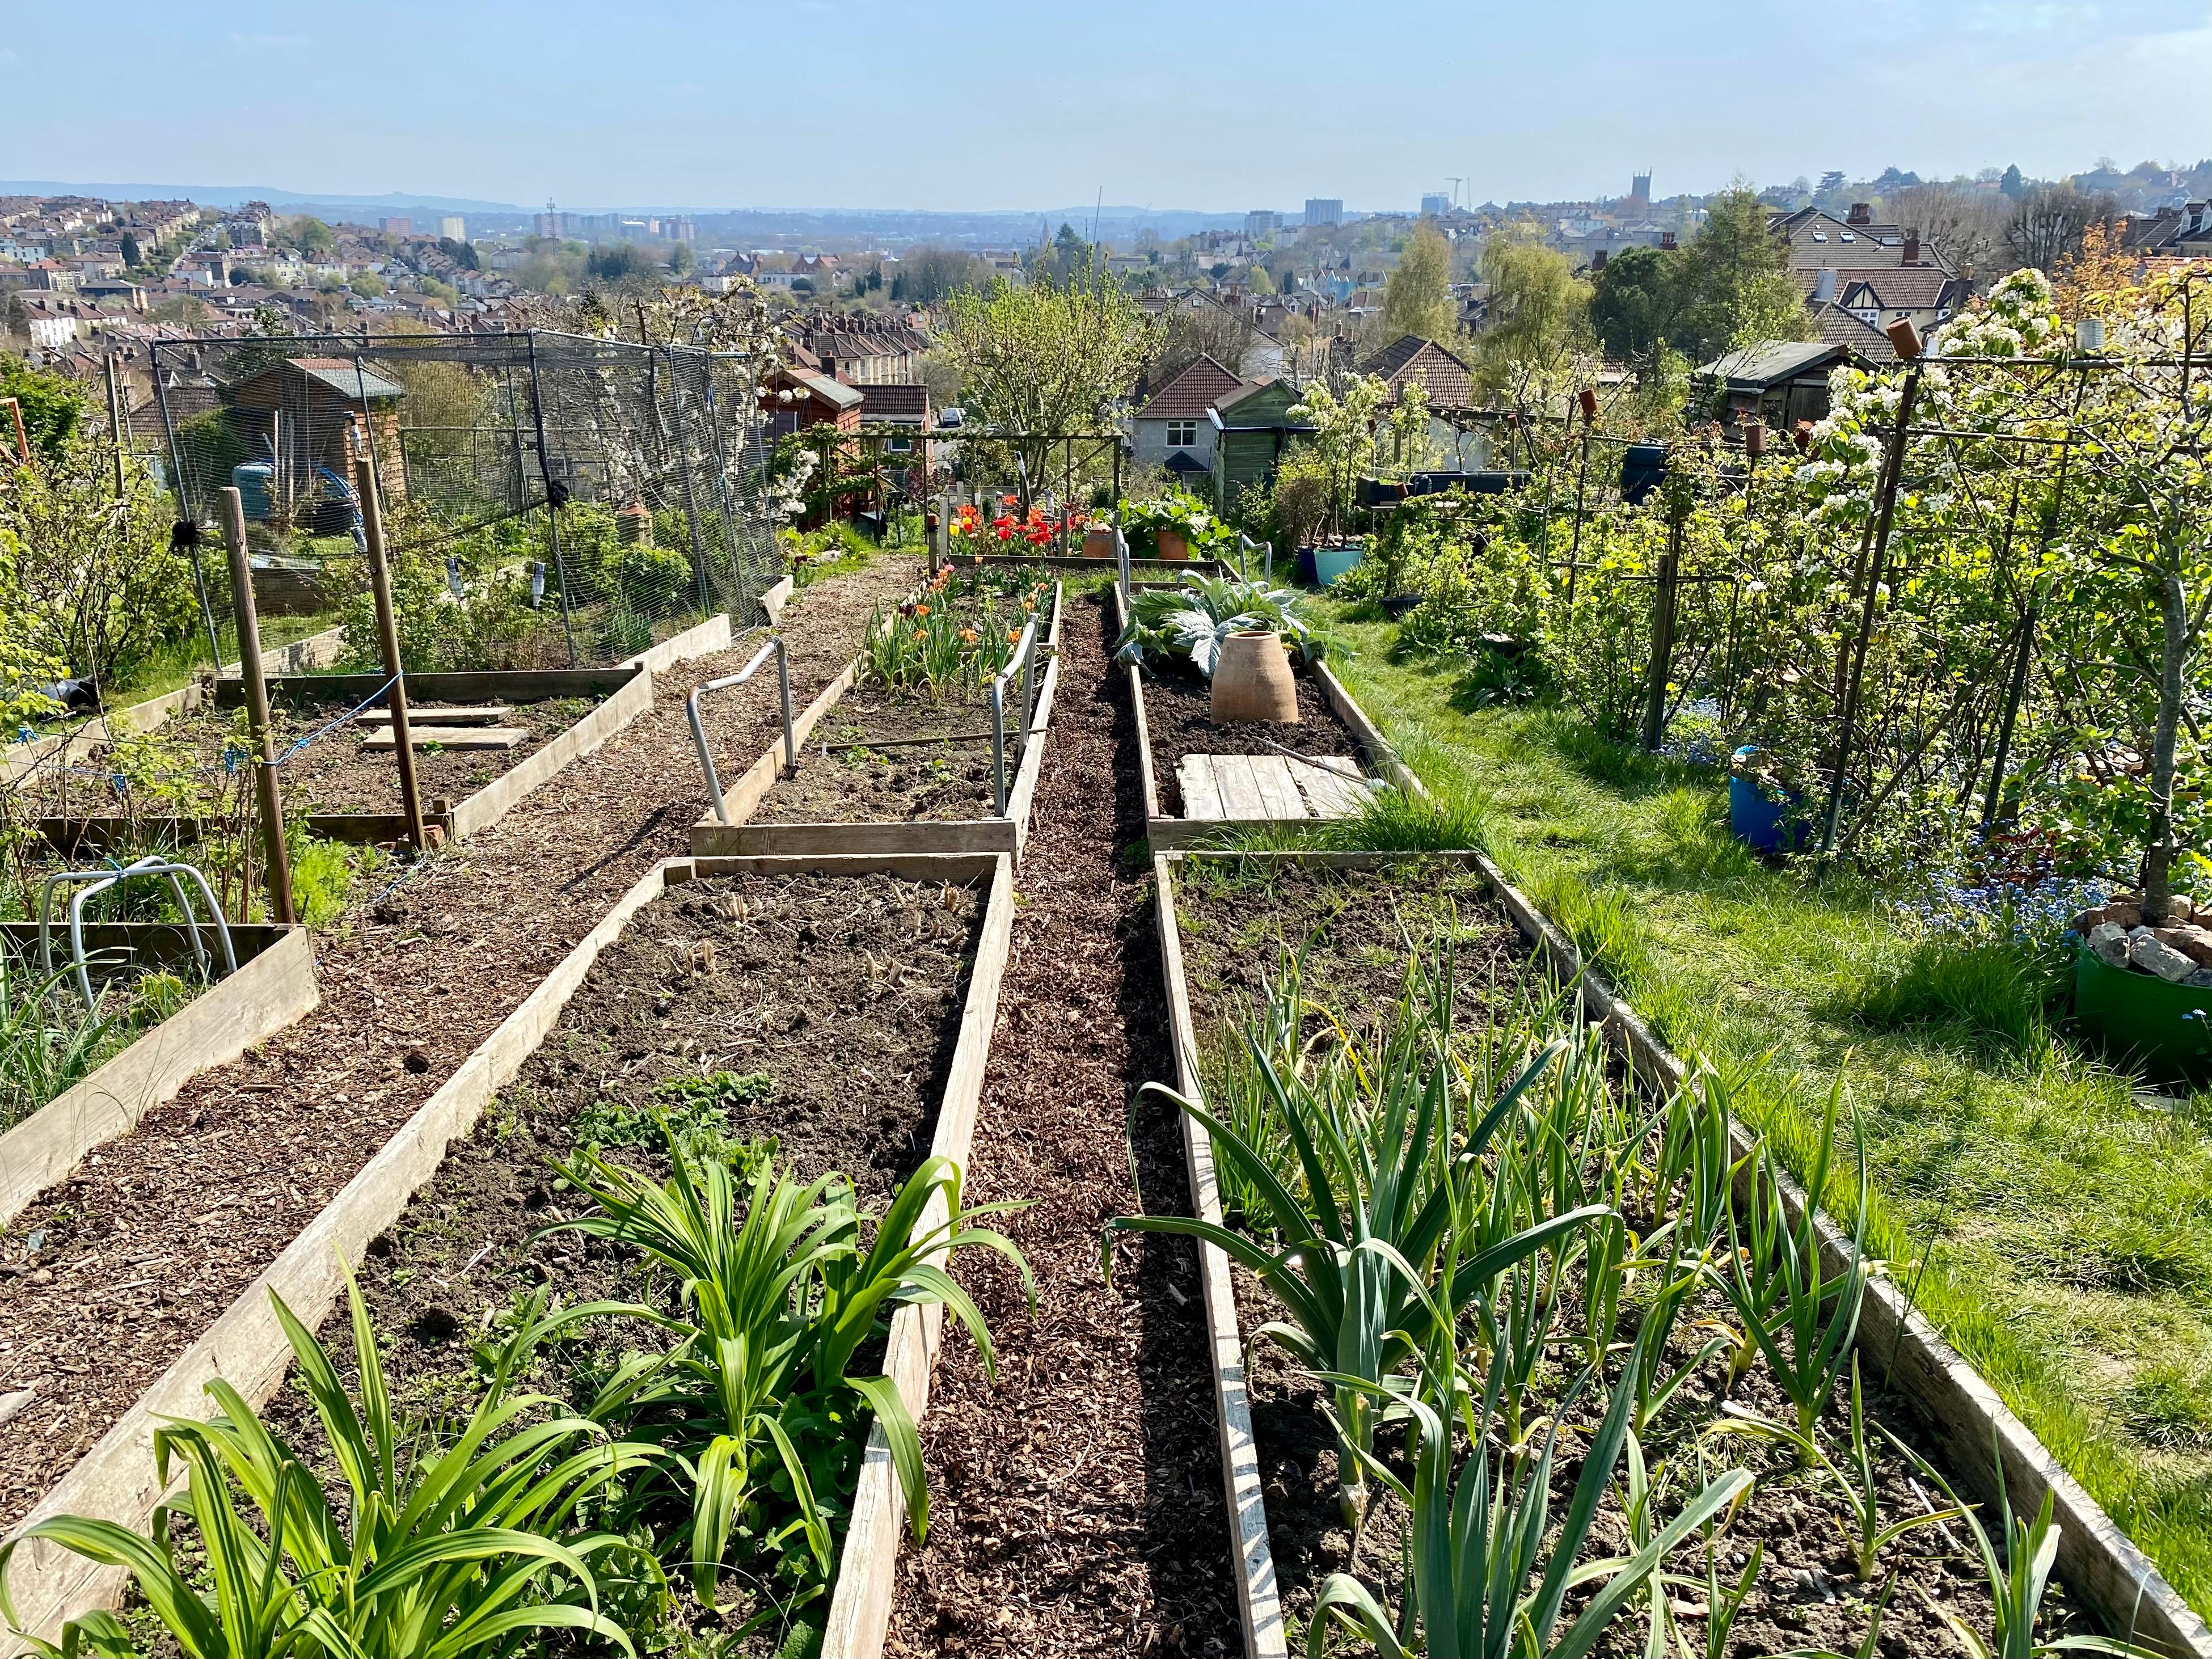 allotment gardening in the sunshine